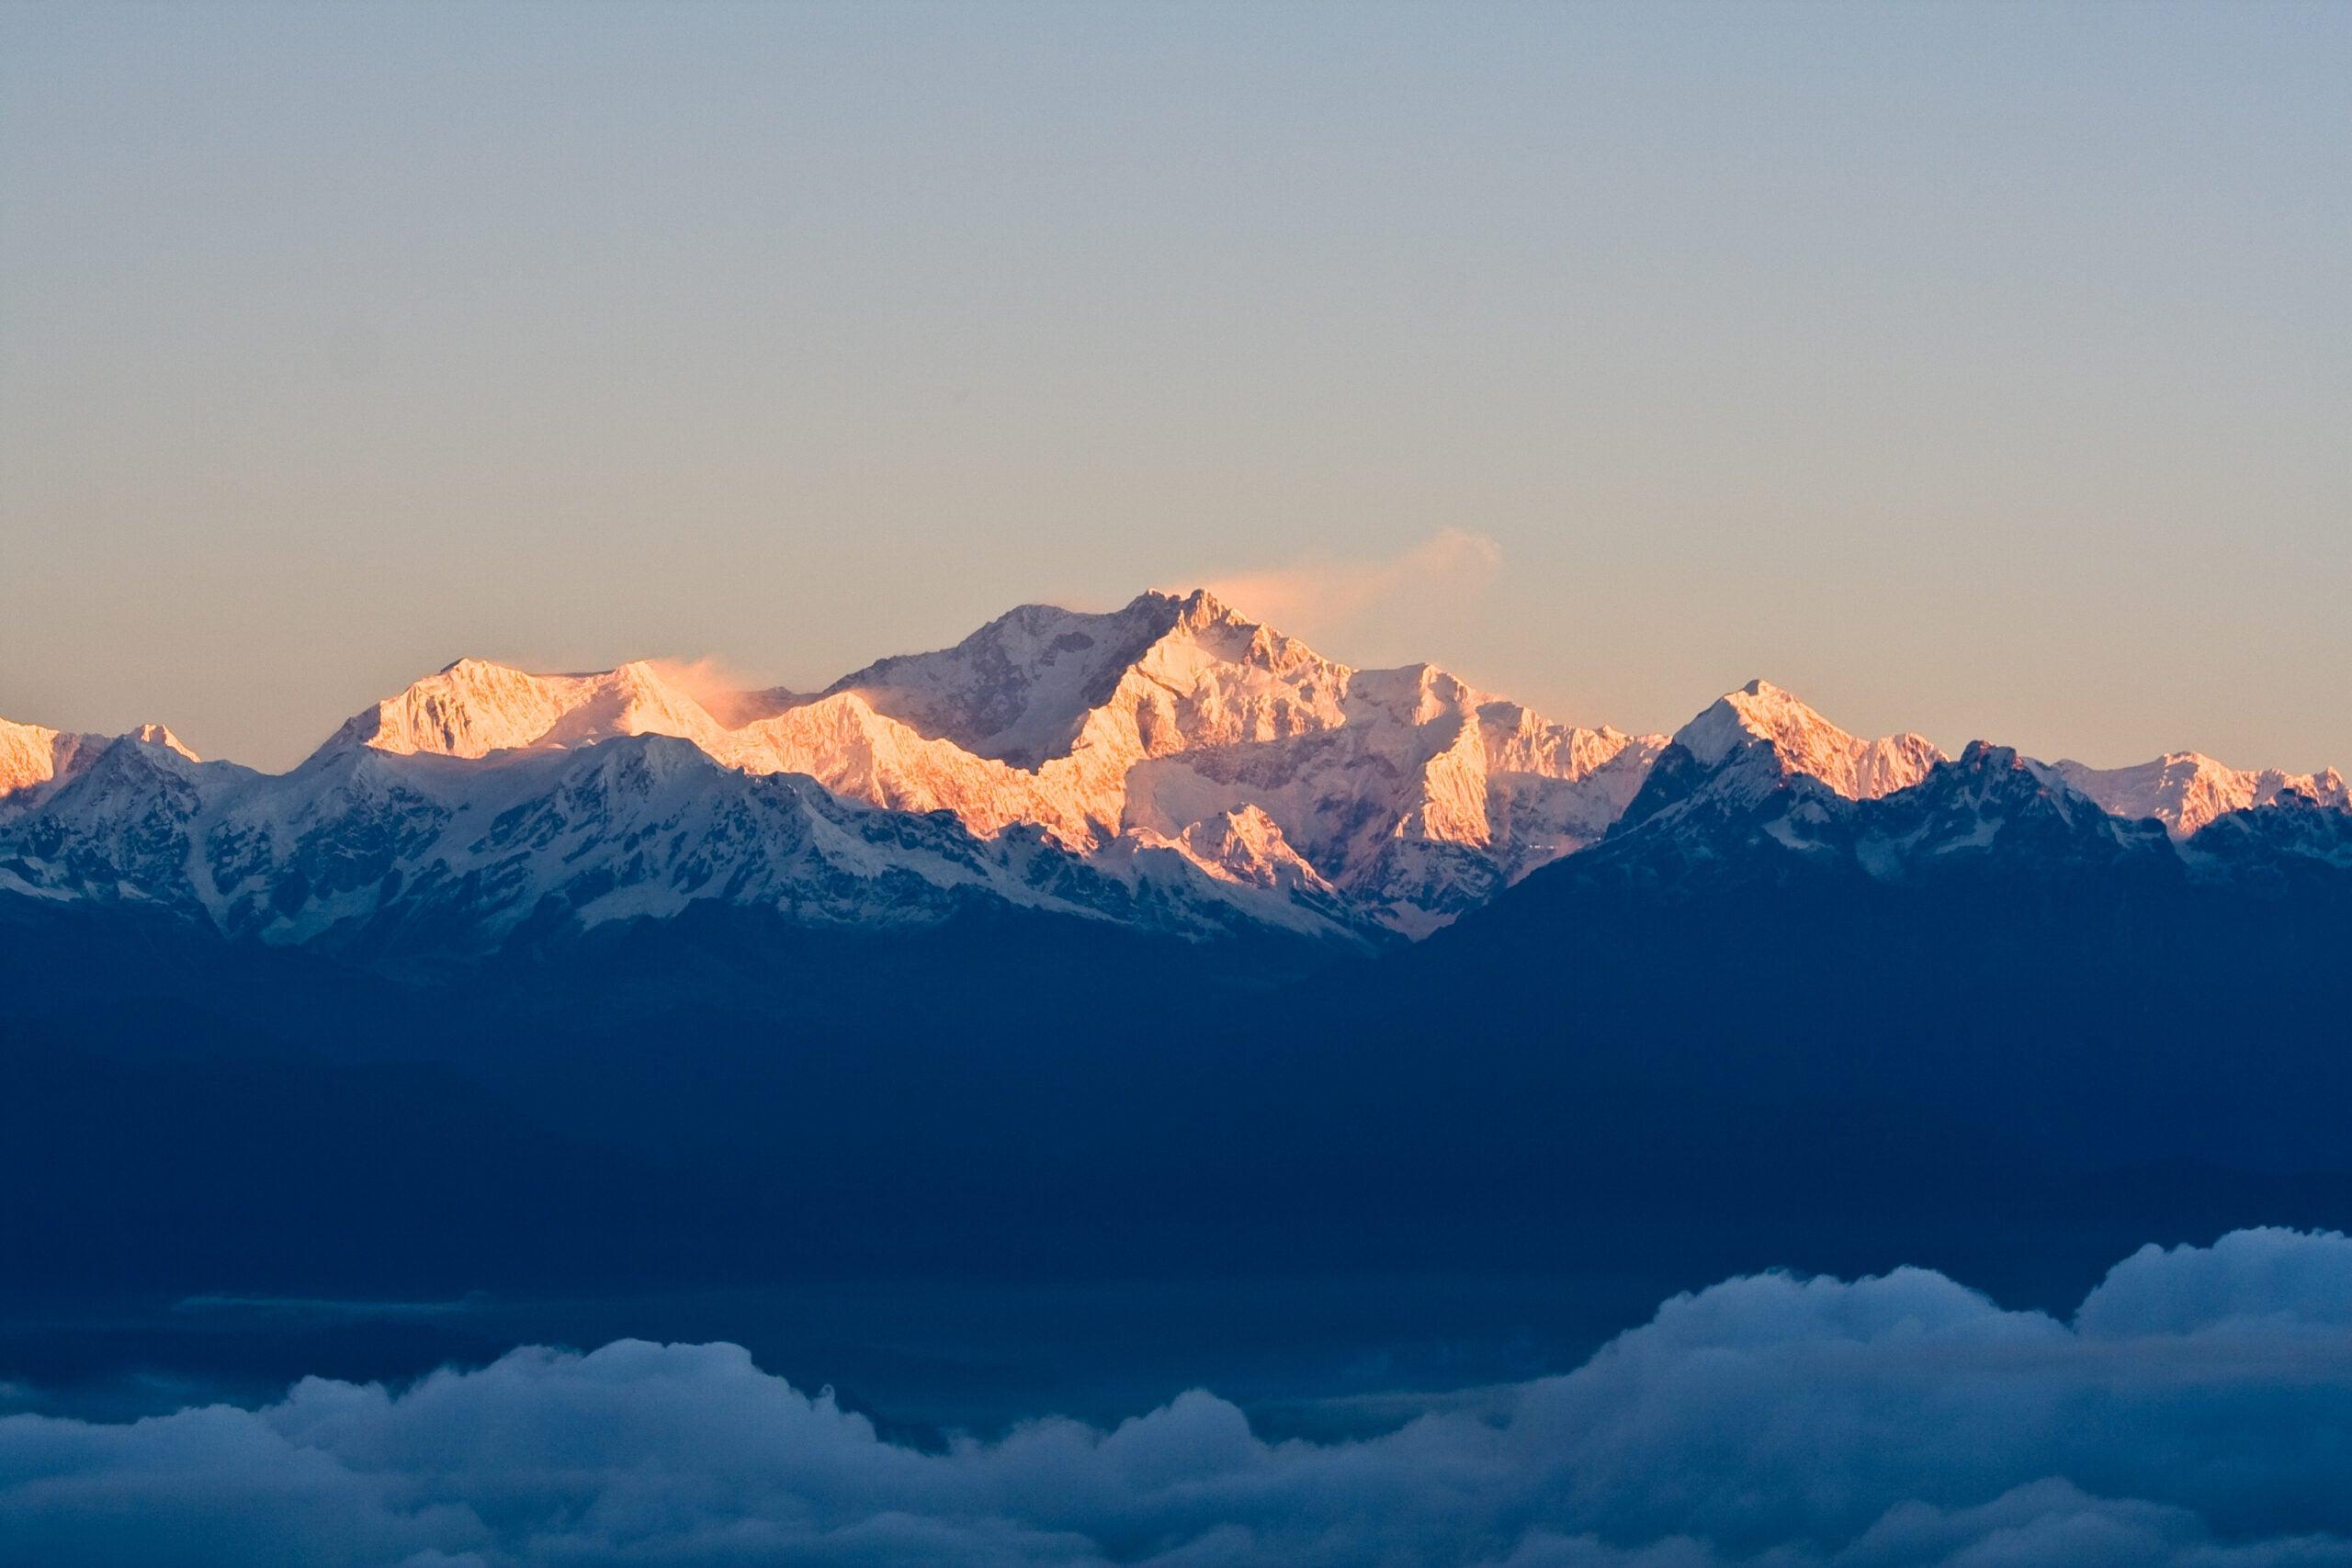 After Major Nepal Earthquake, Himalayas Drop Several Feet